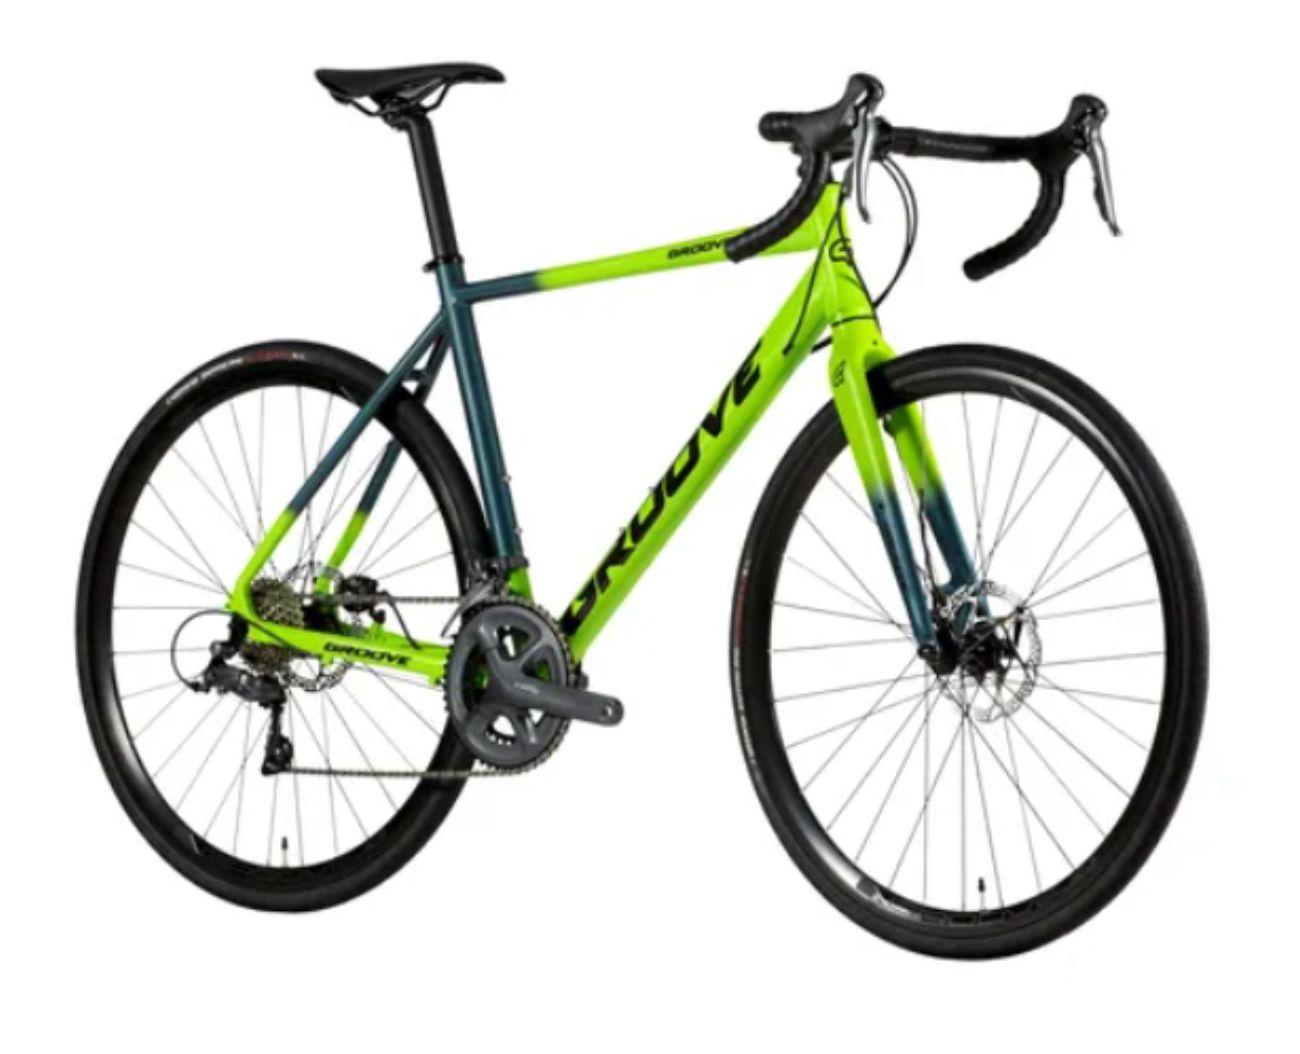 Bicicleta Speed Road Groove Overdrive 50